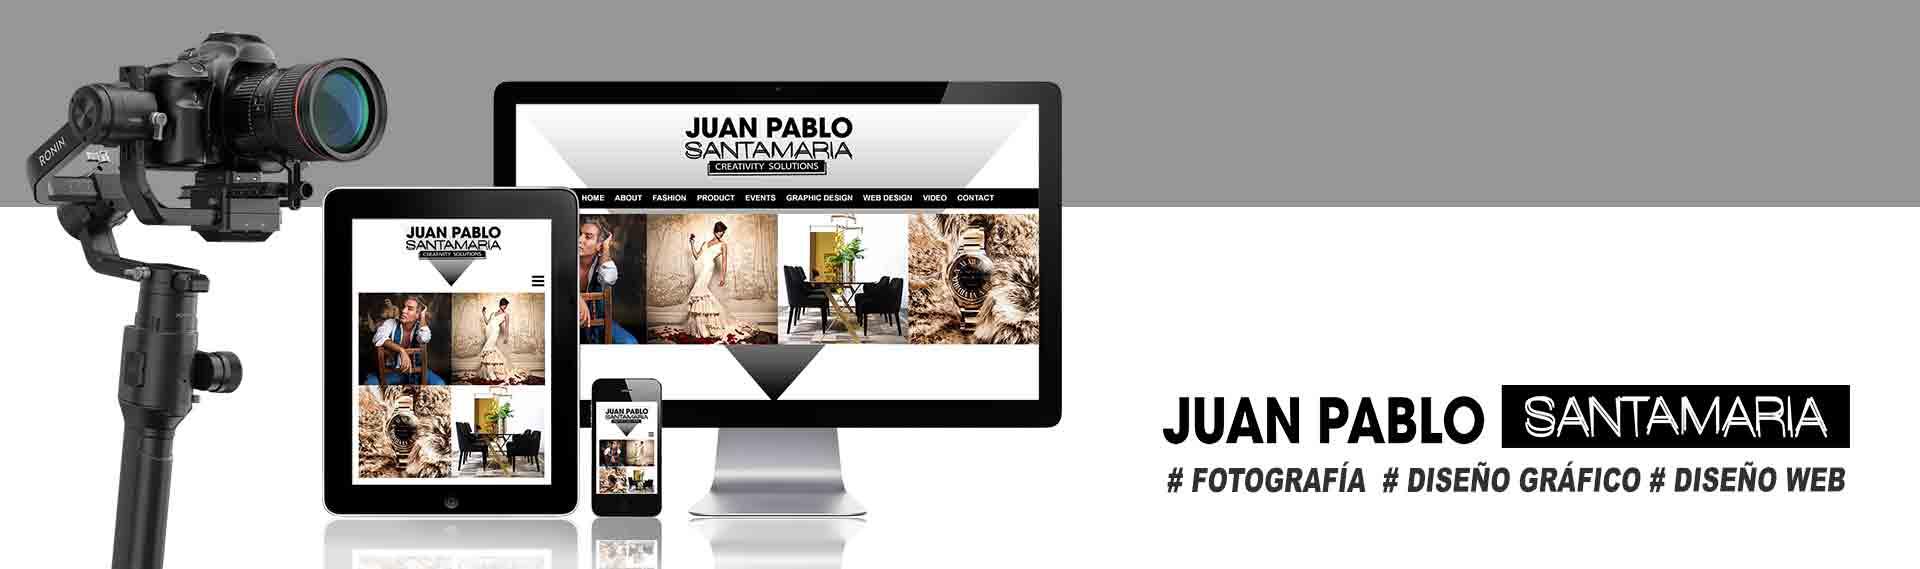 diseno_web_juan_pablo_santamaria